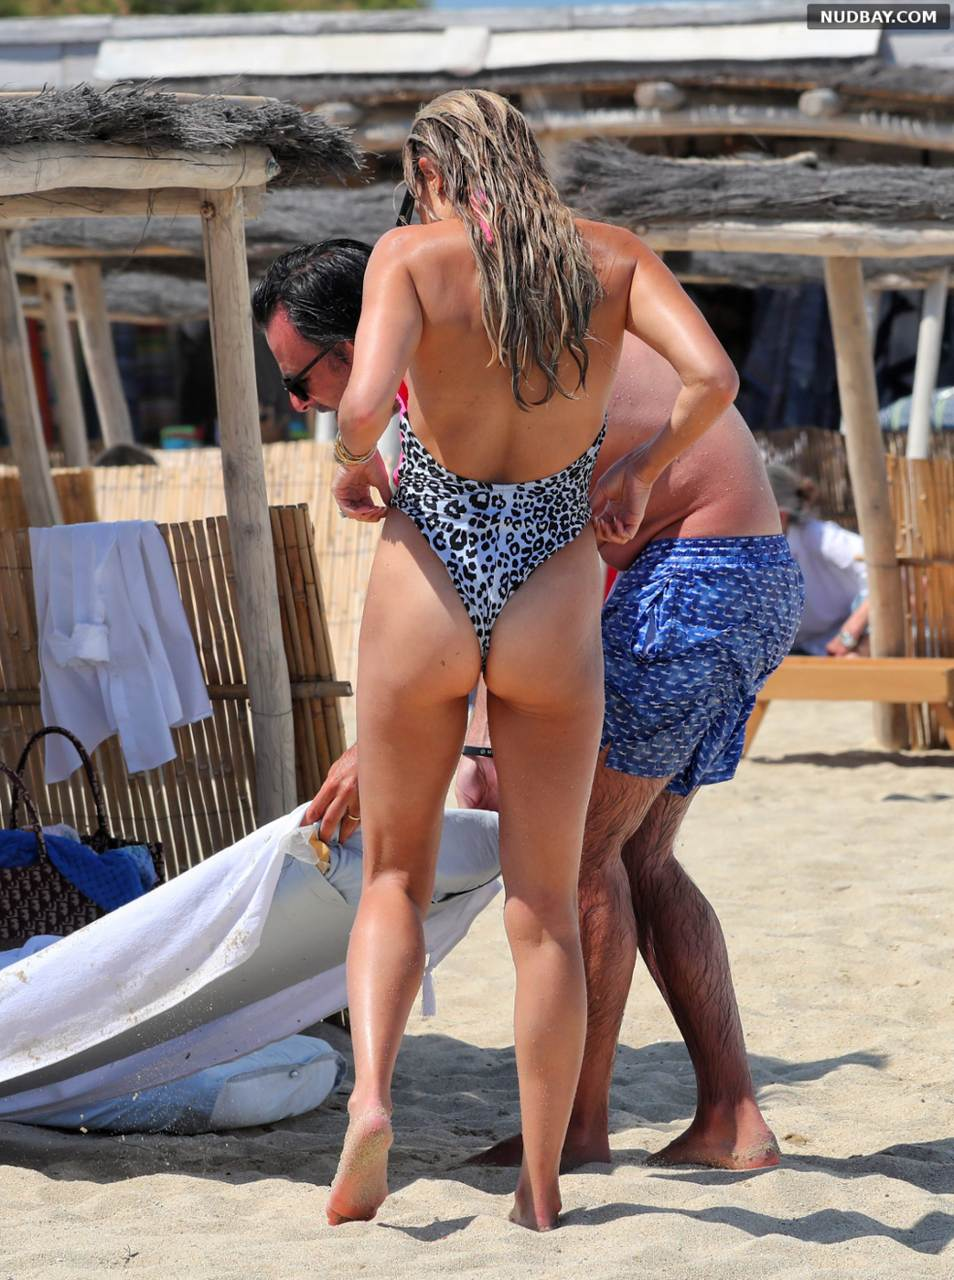 Sylvie Meis ass in swimsuit in Saint Tropez Jun 11 2021